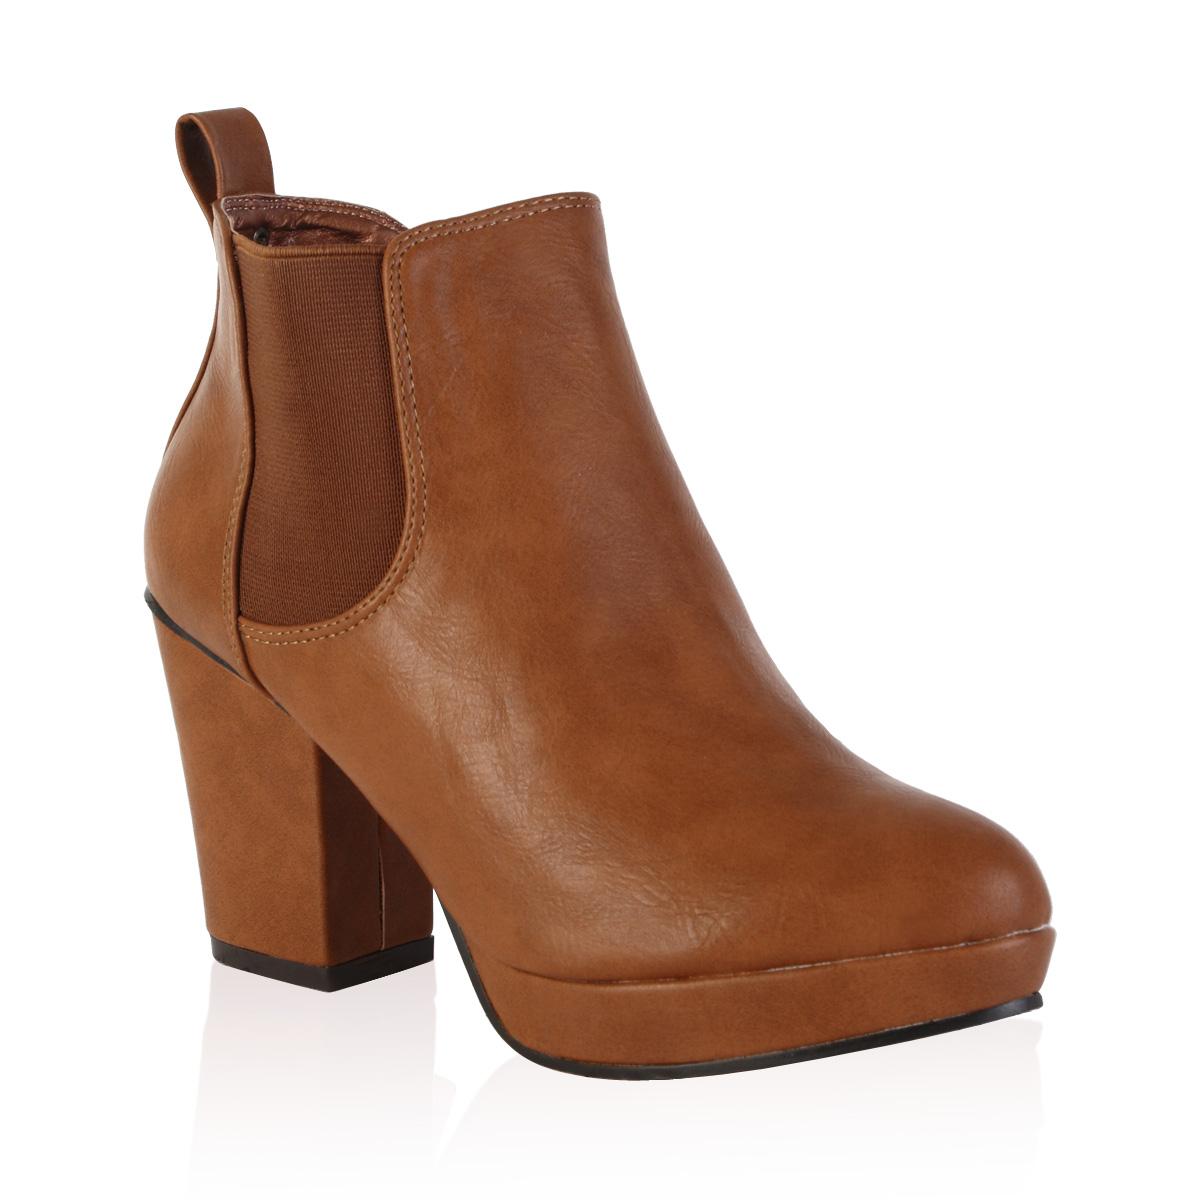 98c womens chelsea boots platform heel shoes size 36 41. Black Bedroom Furniture Sets. Home Design Ideas